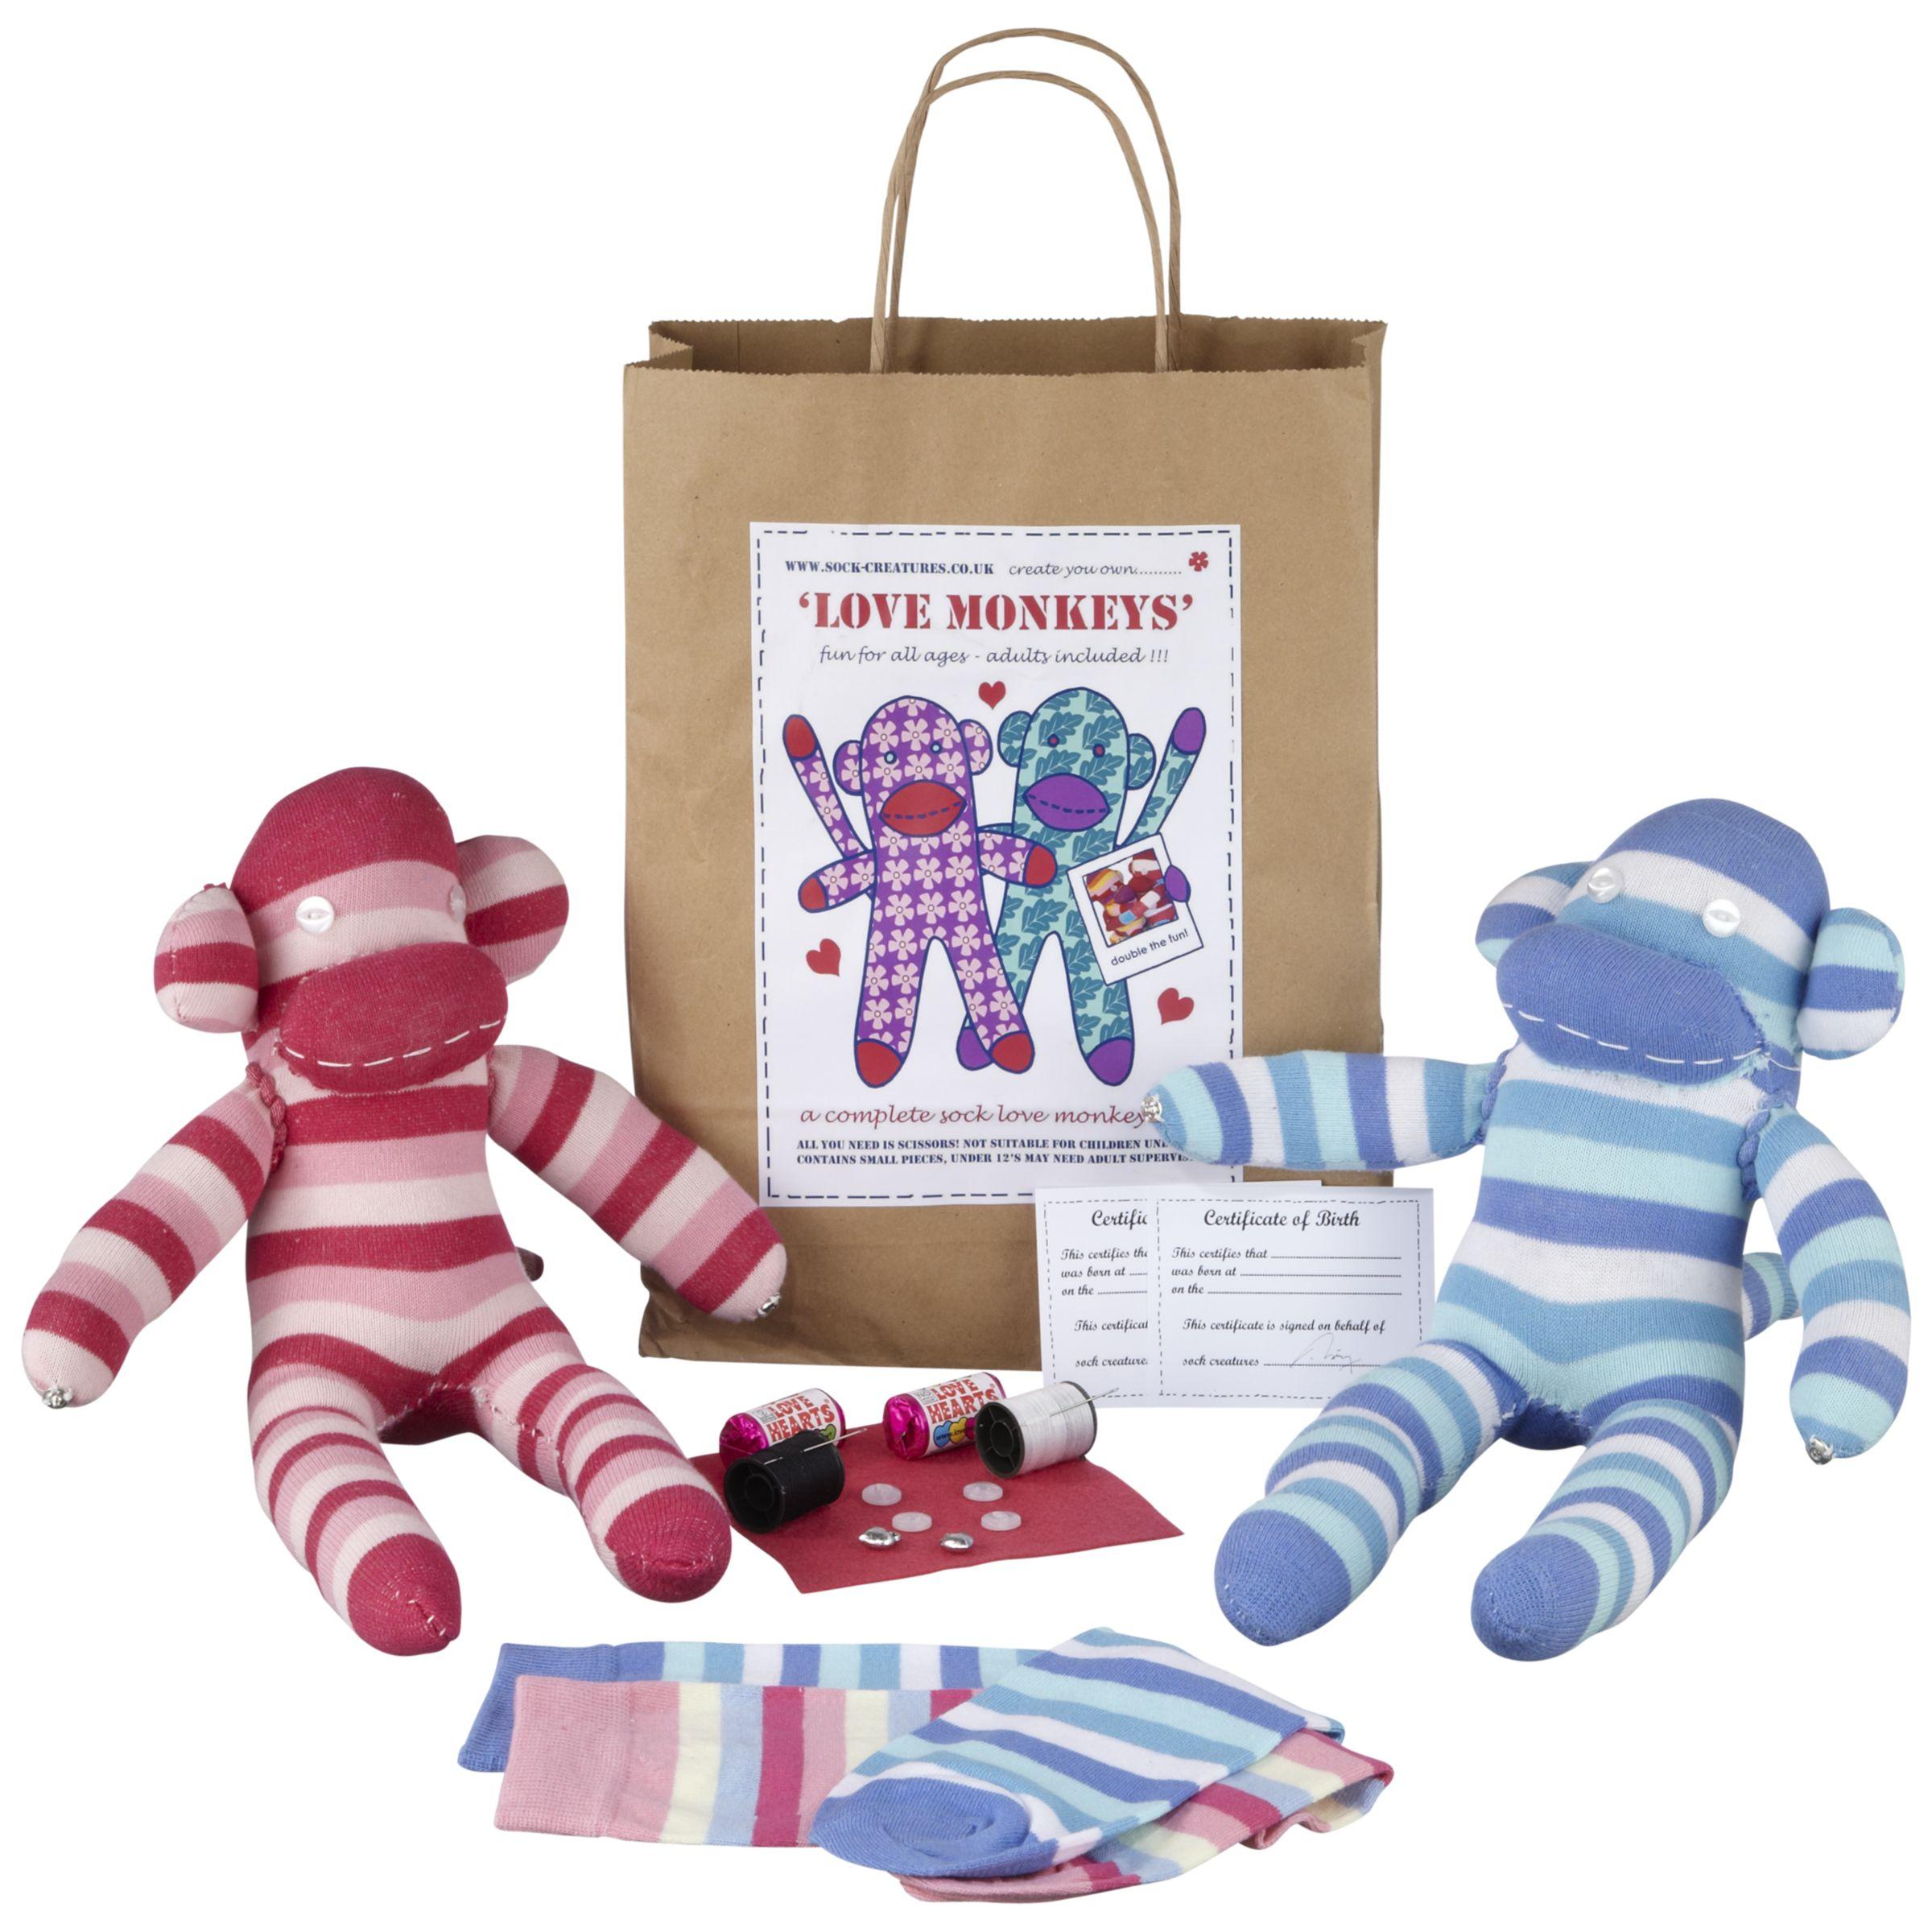 Sock Creatures Sock Creatures Love Monkeys Kit